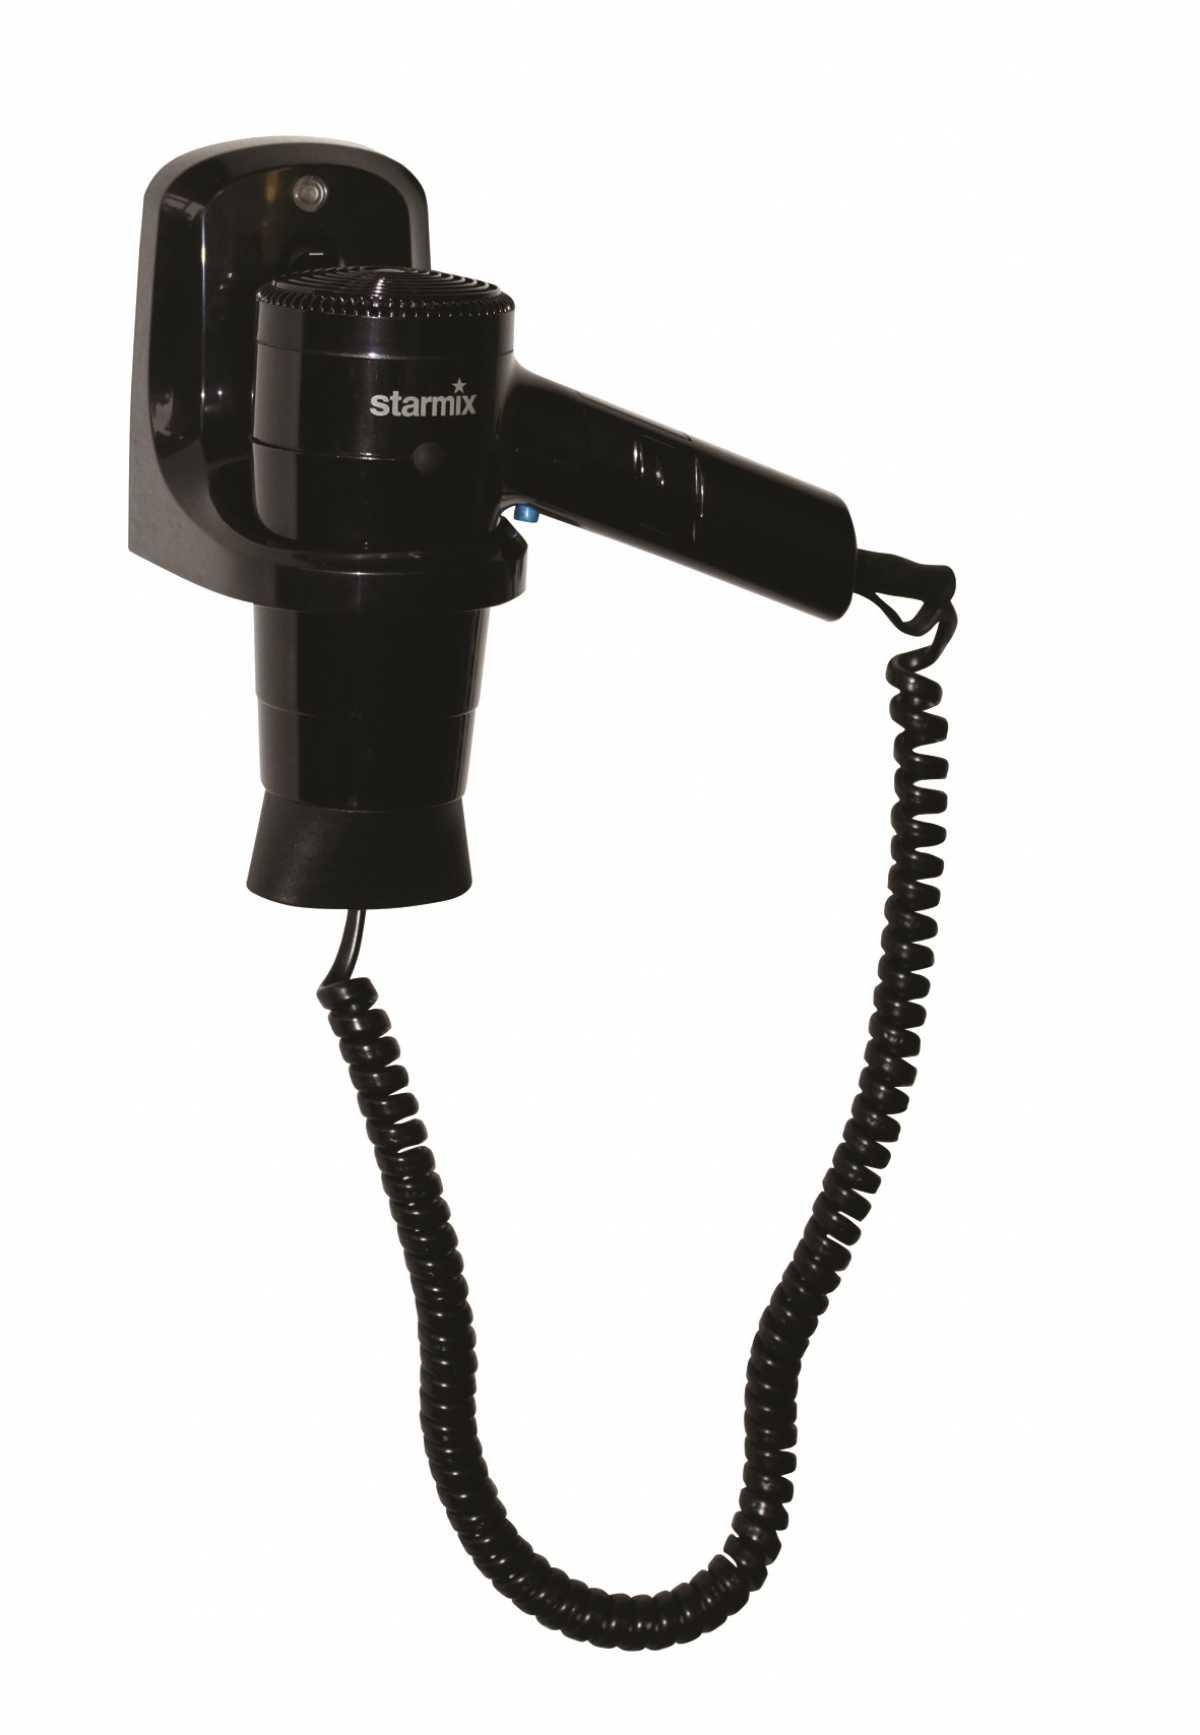 STARMIX HFTW 16 / HFT 16 H Spiral Kablolu Saç Kurutma Makinesi